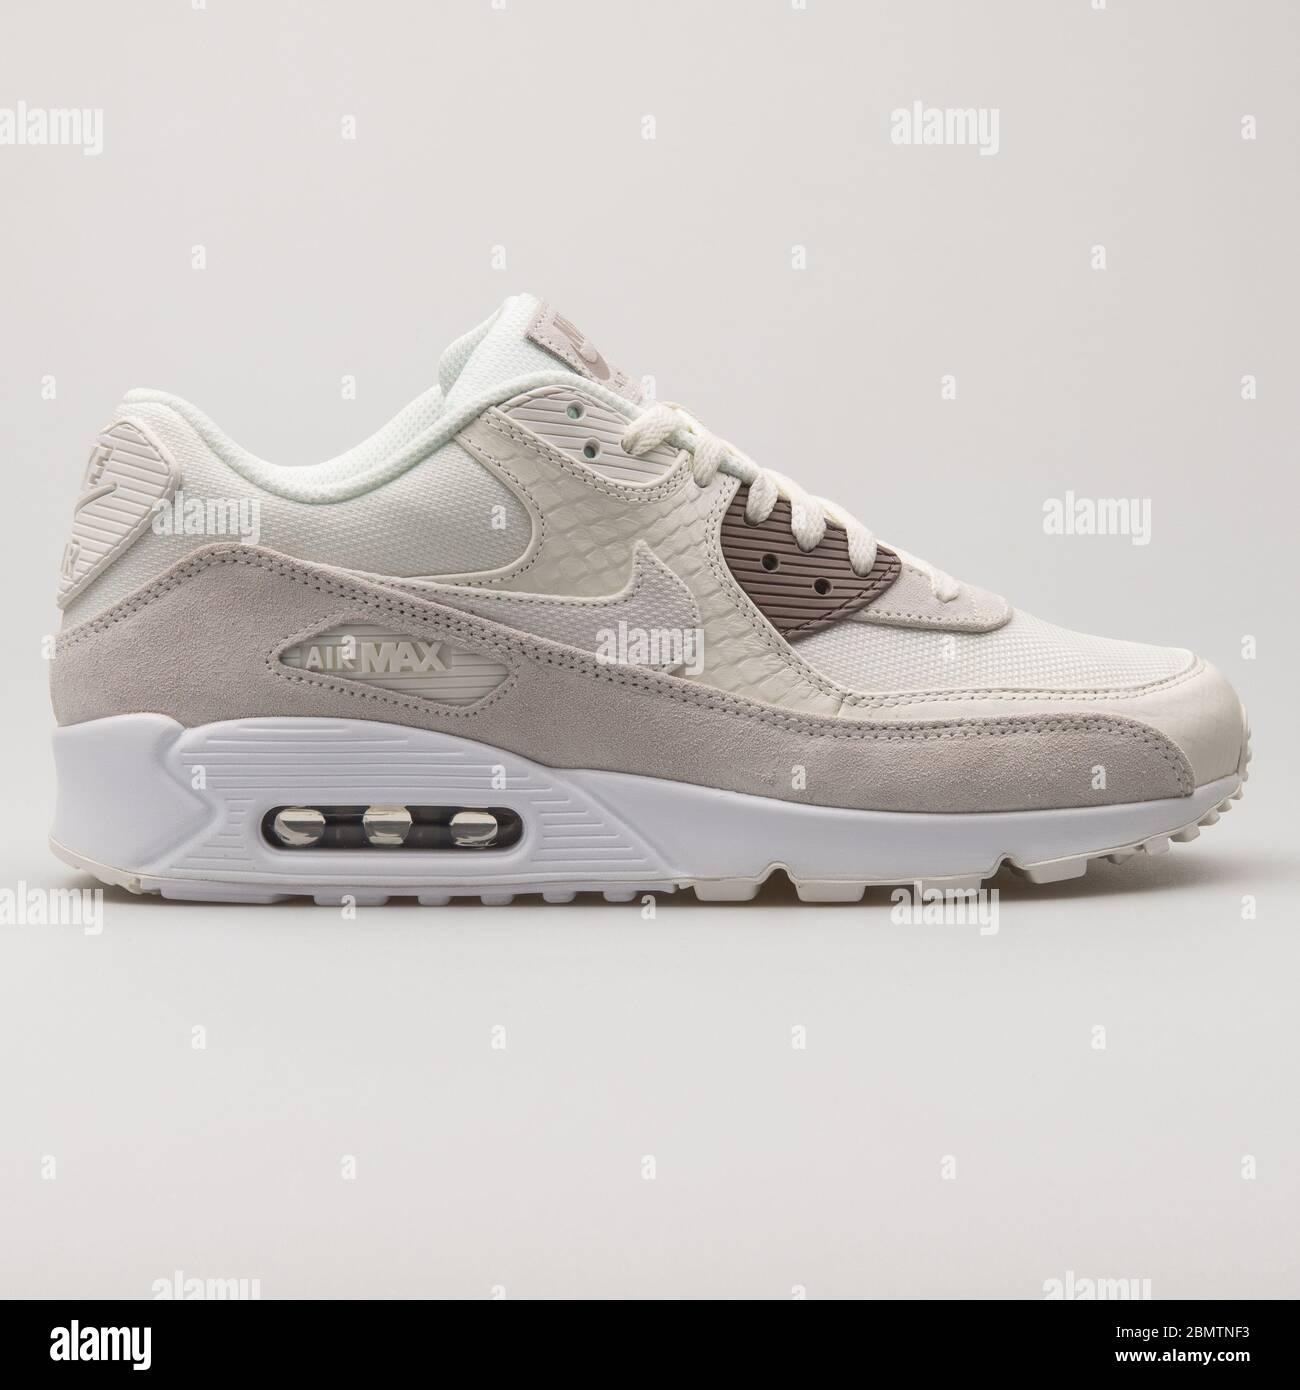 Nike Air Max 90 Premium beige and white